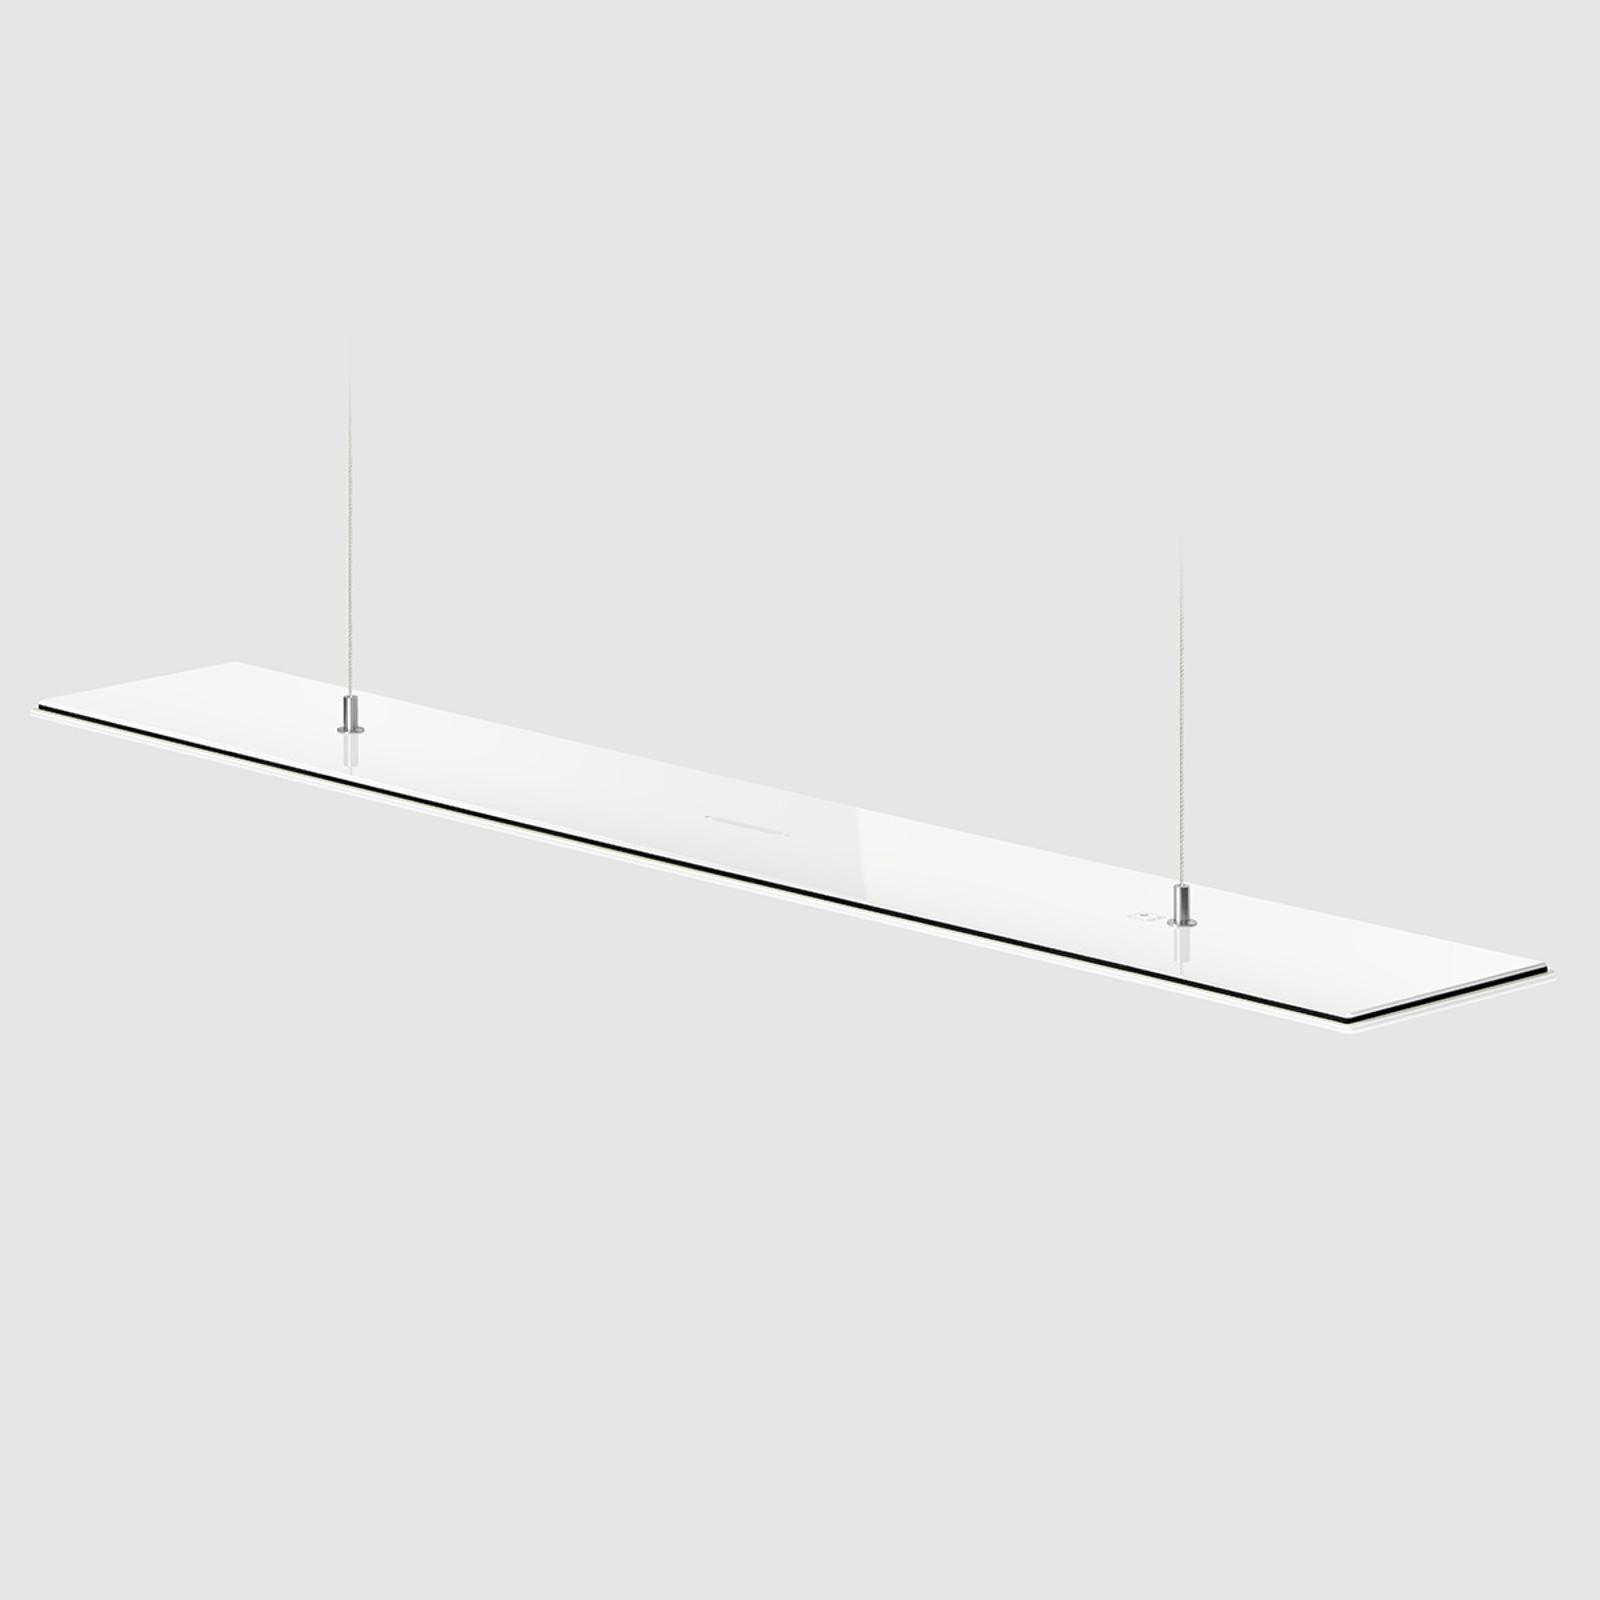 OLED-Hängelampe OMLED One s5L - weiß